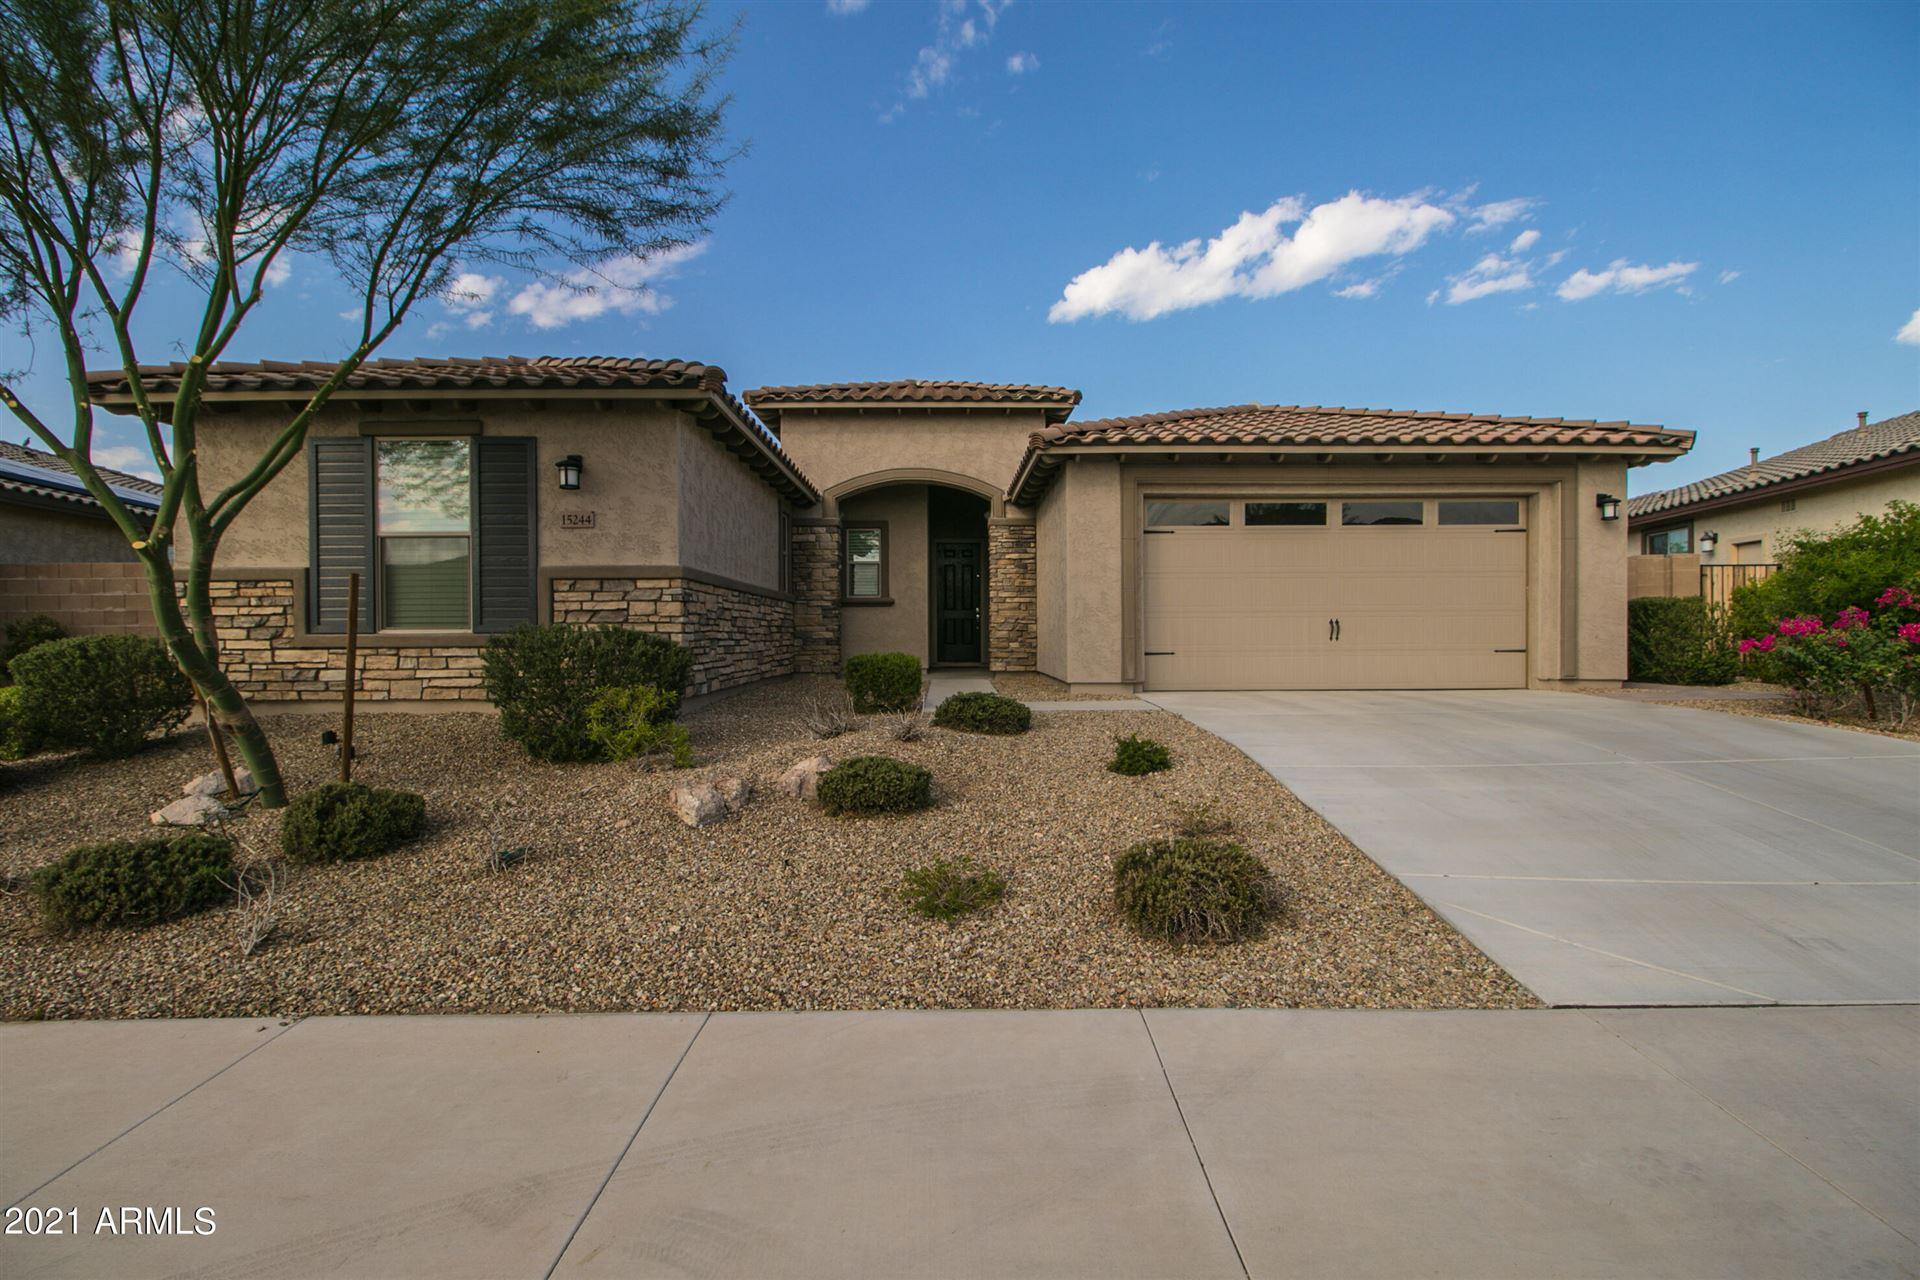 Photo of 15244 S 183rd Avenue, Goodyear, AZ 85338 (MLS # 6295930)